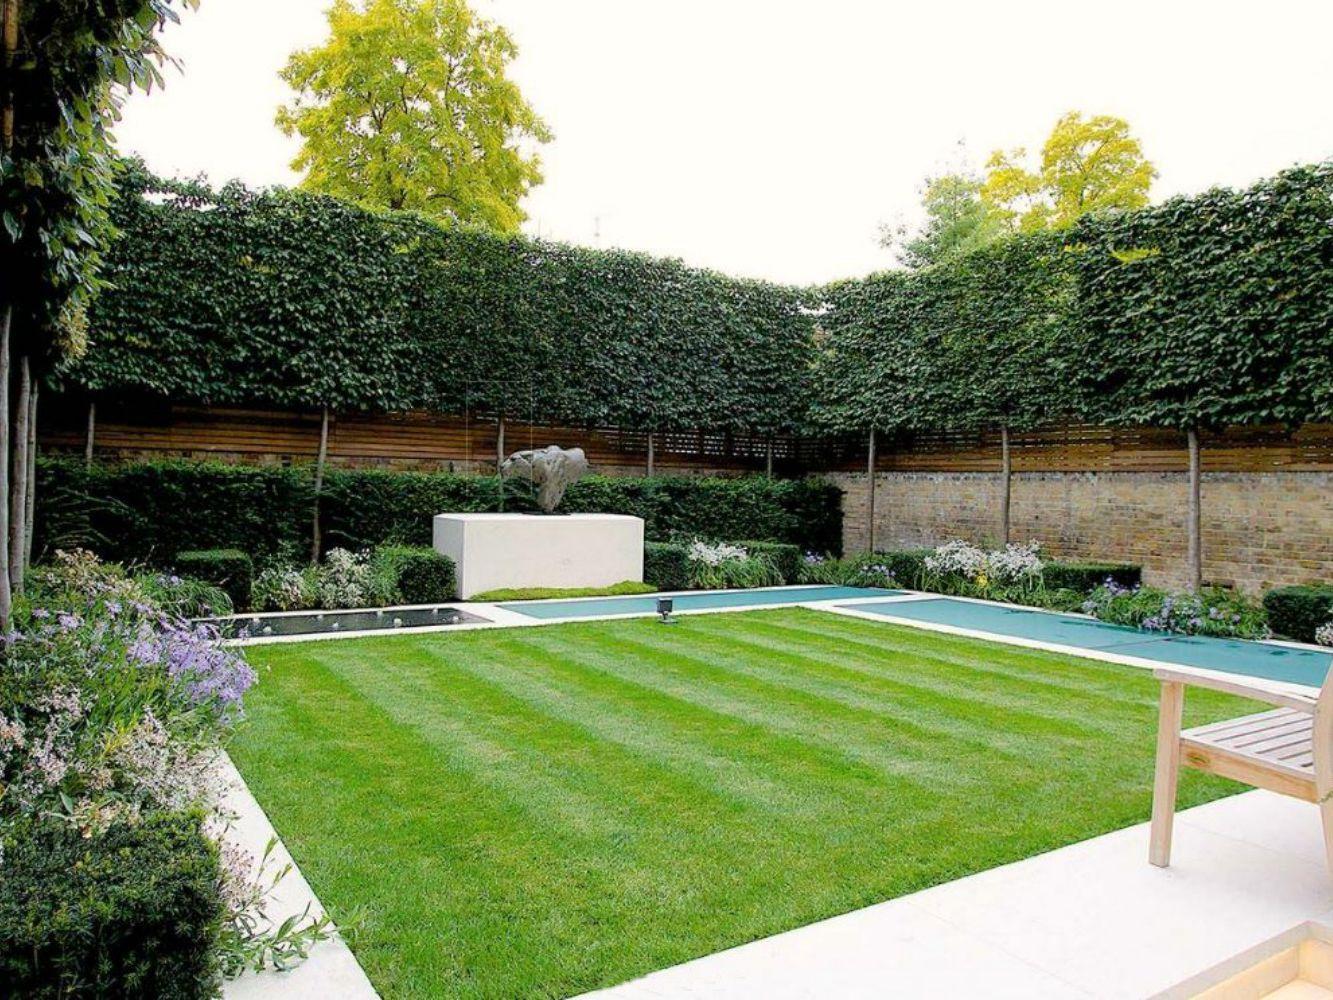 Artificial Garden Plant Pivacy Fence Decoration Extension  Garden Decor Outdoor